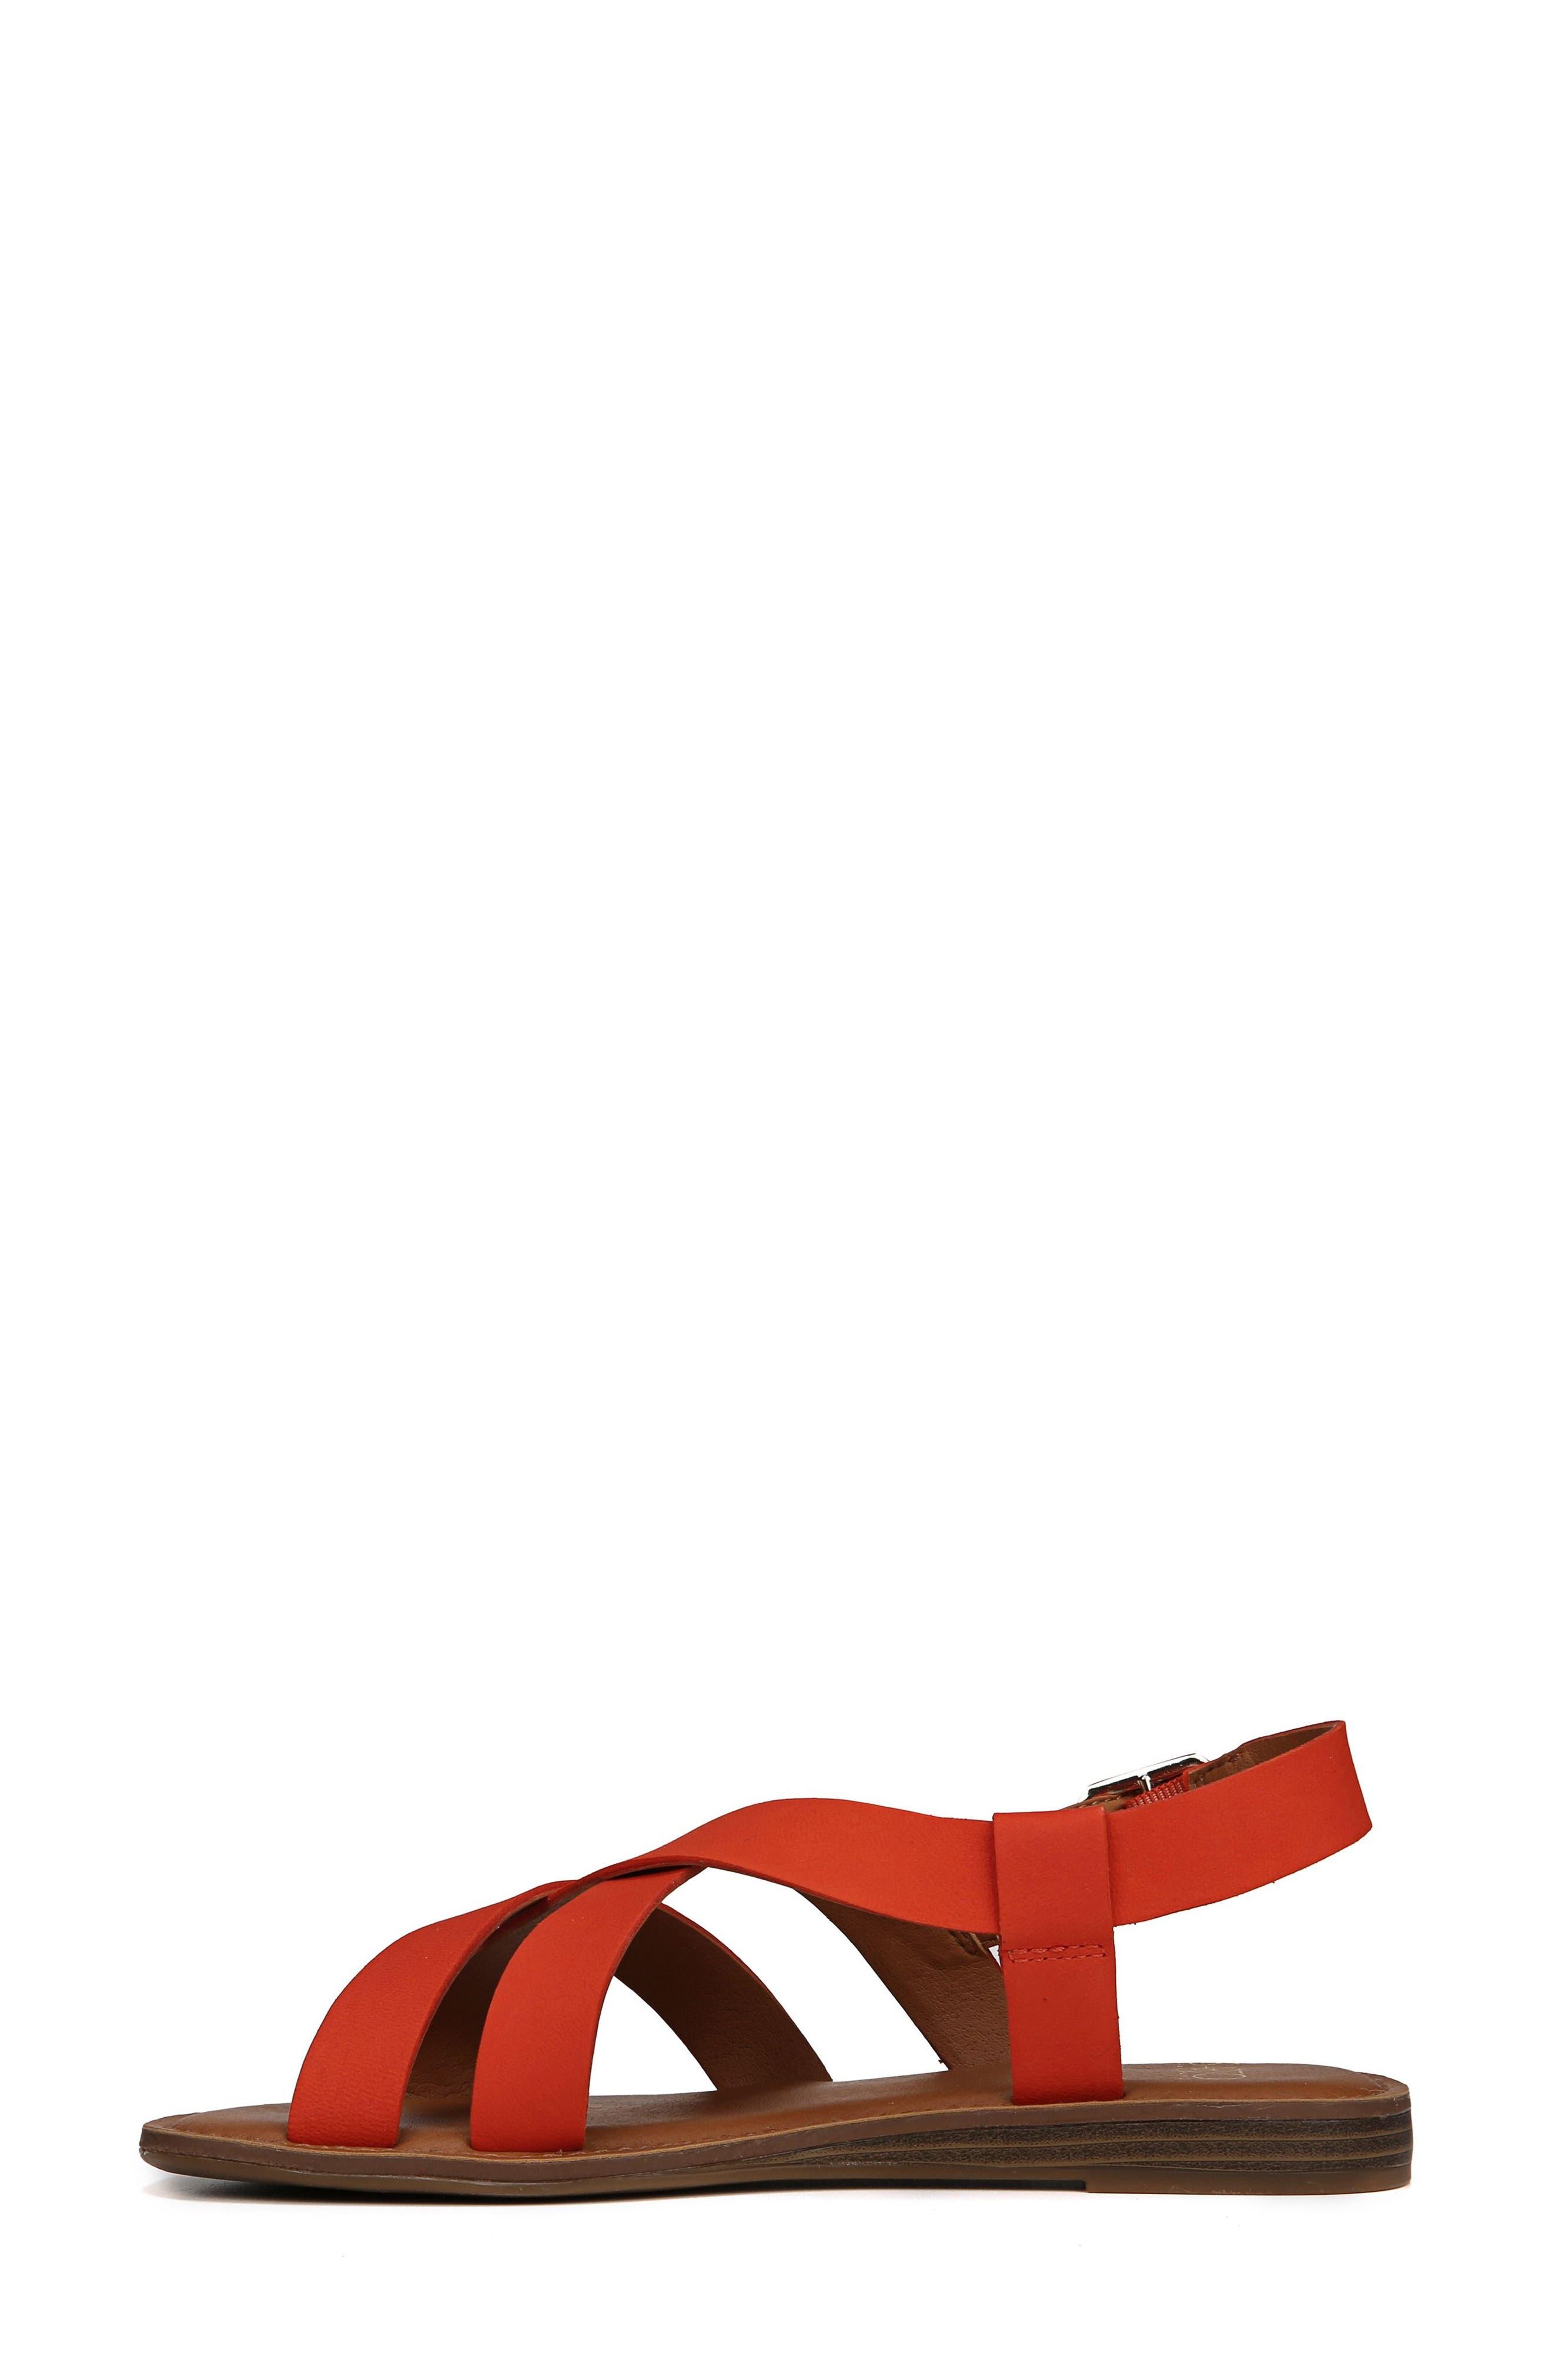 Galavant Sandal,                             Alternate thumbnail 12, color,